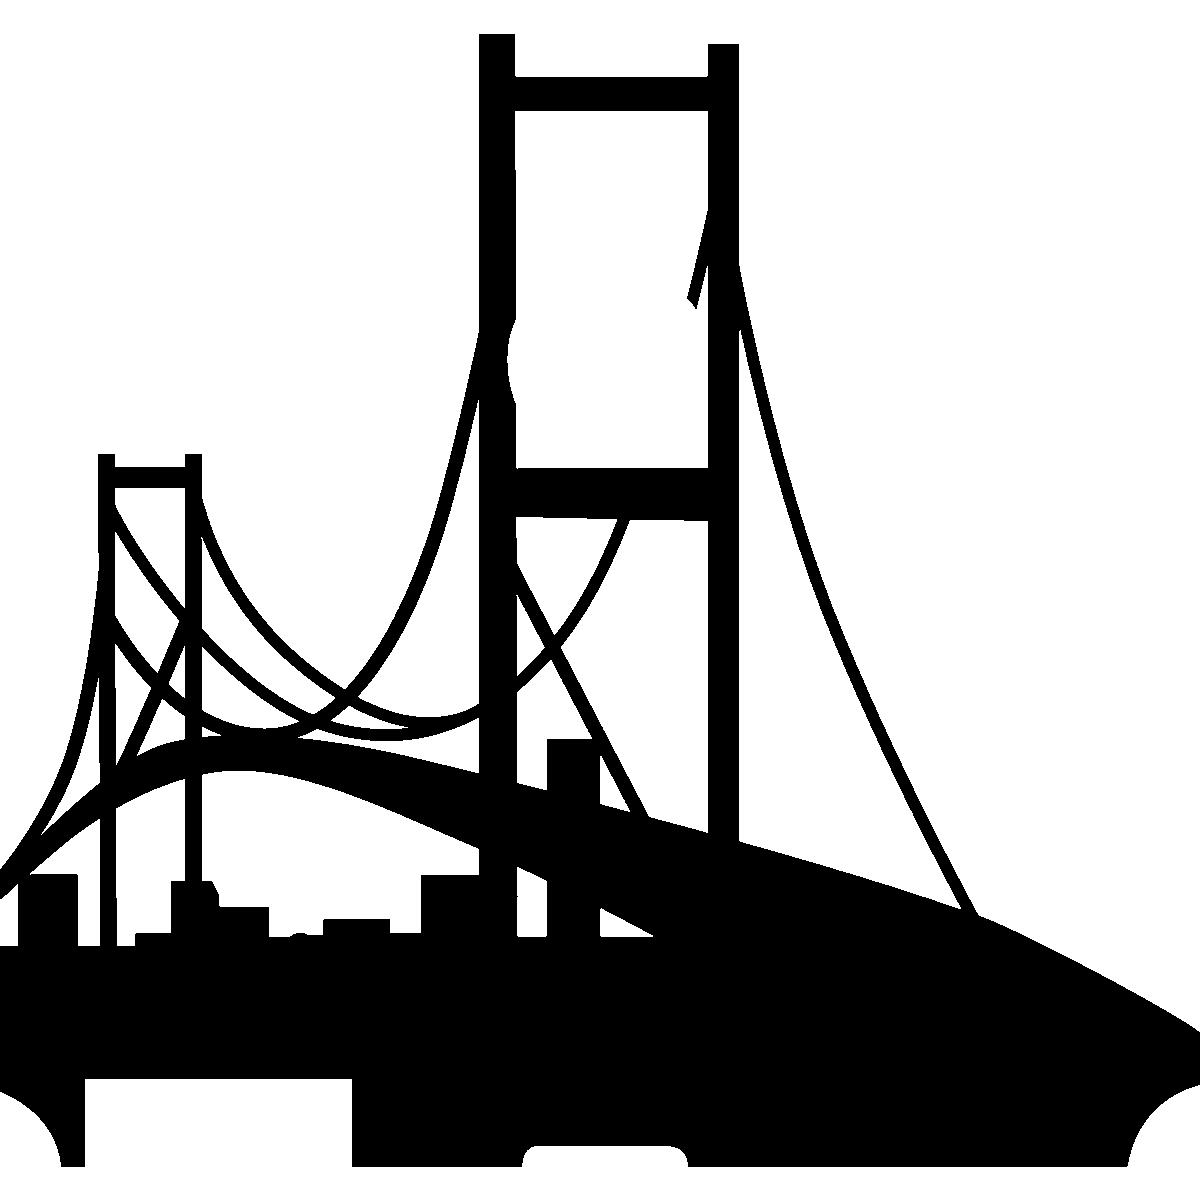 1200x1200 15 Golden Gate Bridge Silhouette Png For Free Download On Mbtskoudsalg